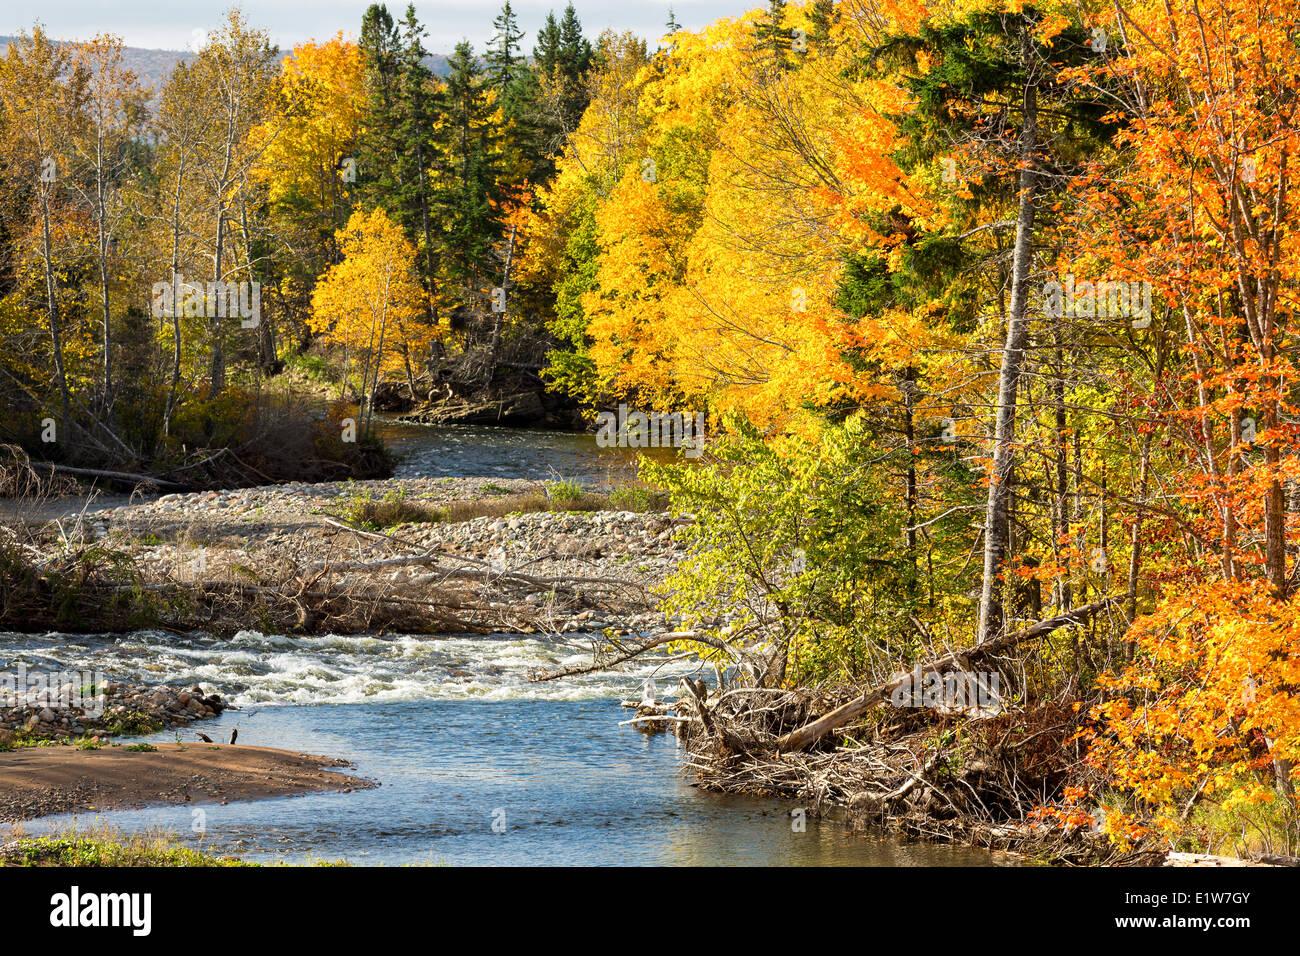 Middle River West, Cape Breton, Nova Scotia, Canada - Stock Image